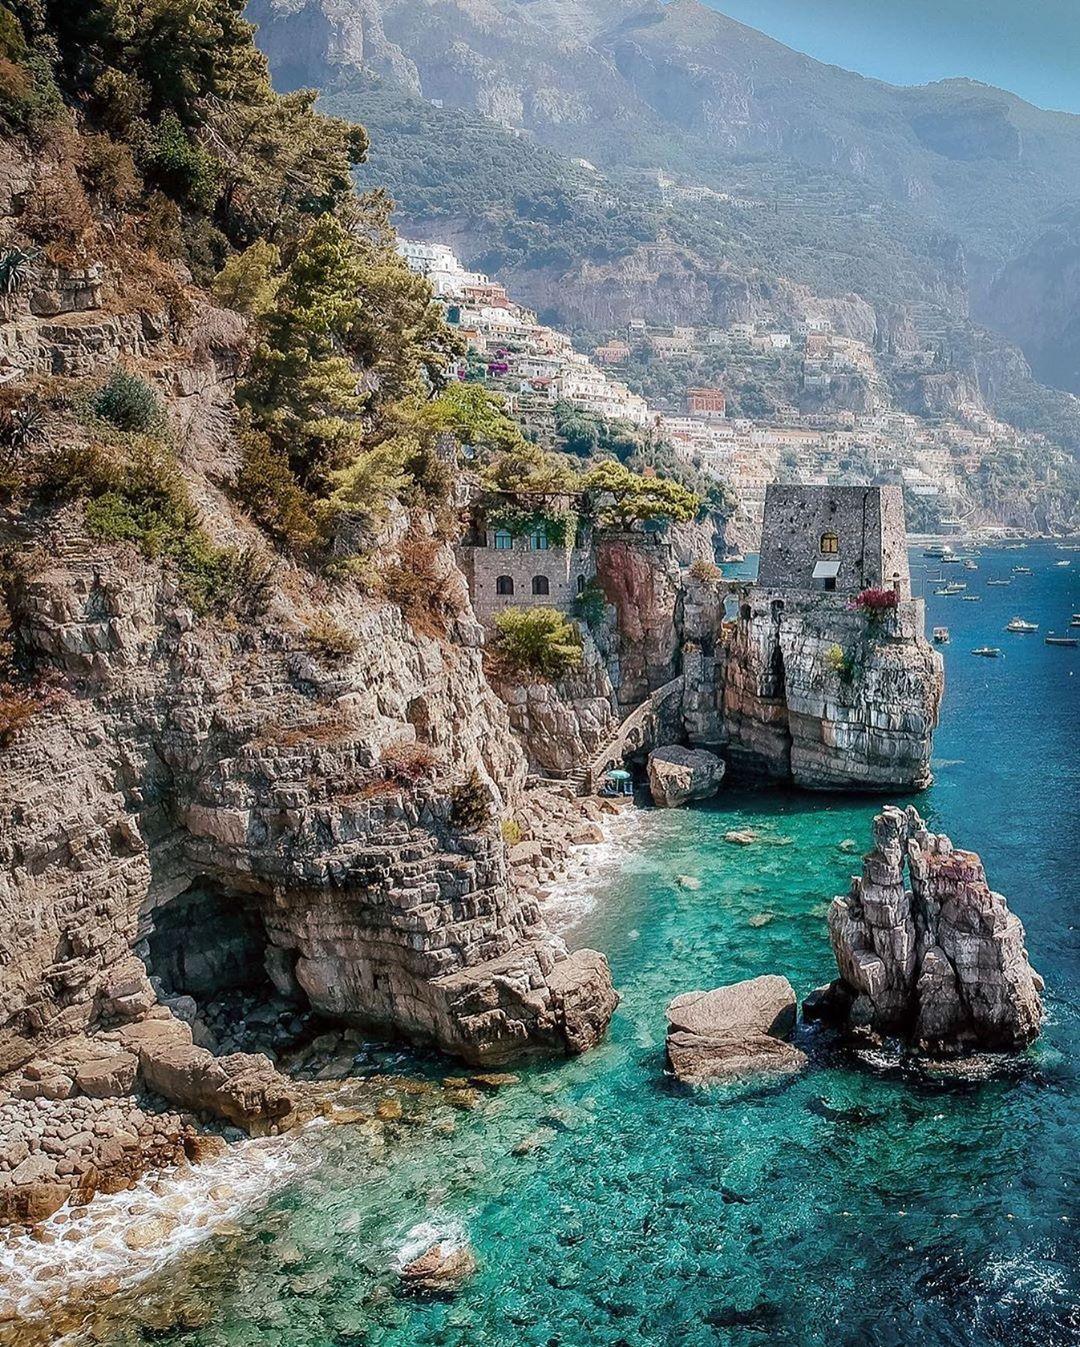 Amalfi Coast Italy On Instagram The Magic Of Positanocoast We Hope To Welcome You Soon To Our Wonderful Amalficoast In 2020 Amalfi Coast Italy Amalfi Coast Amalfi